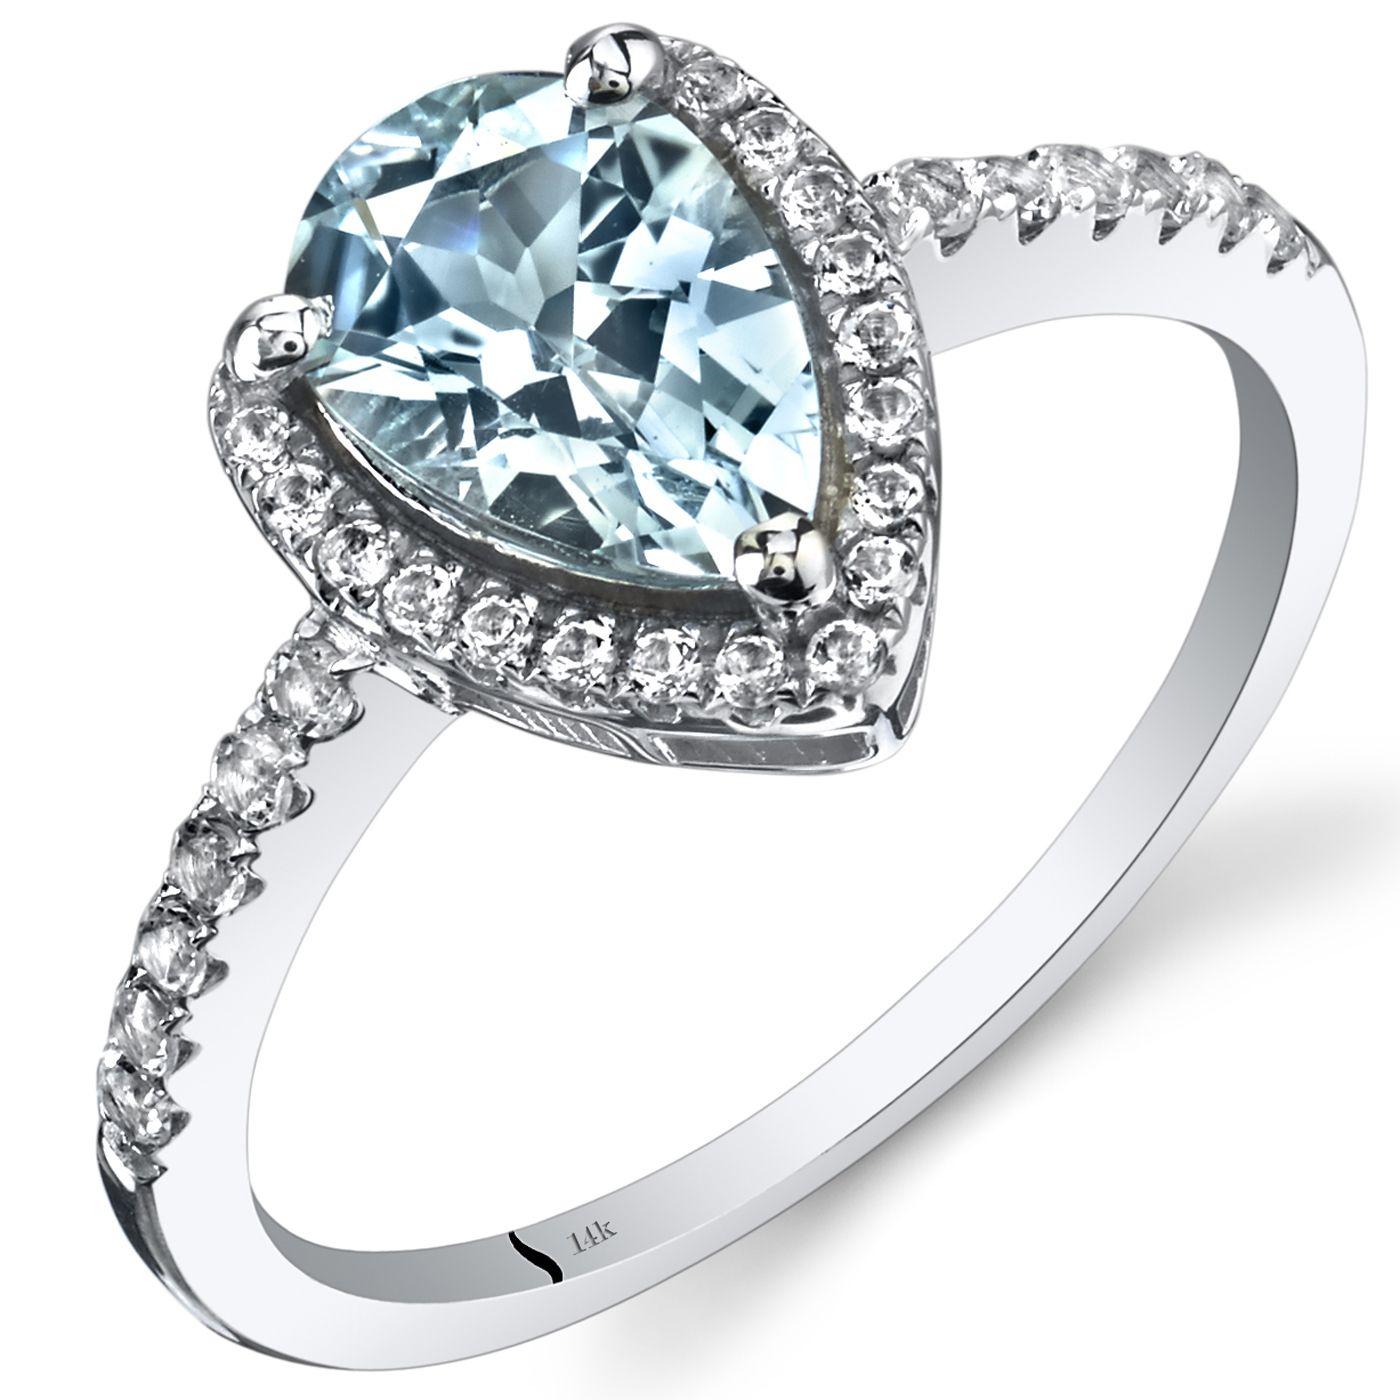 Oravo 14k White Gold Pear-cut Gemstone Open Halo Ring (1.25 ct Create Emerald Size 5), Women's, Green